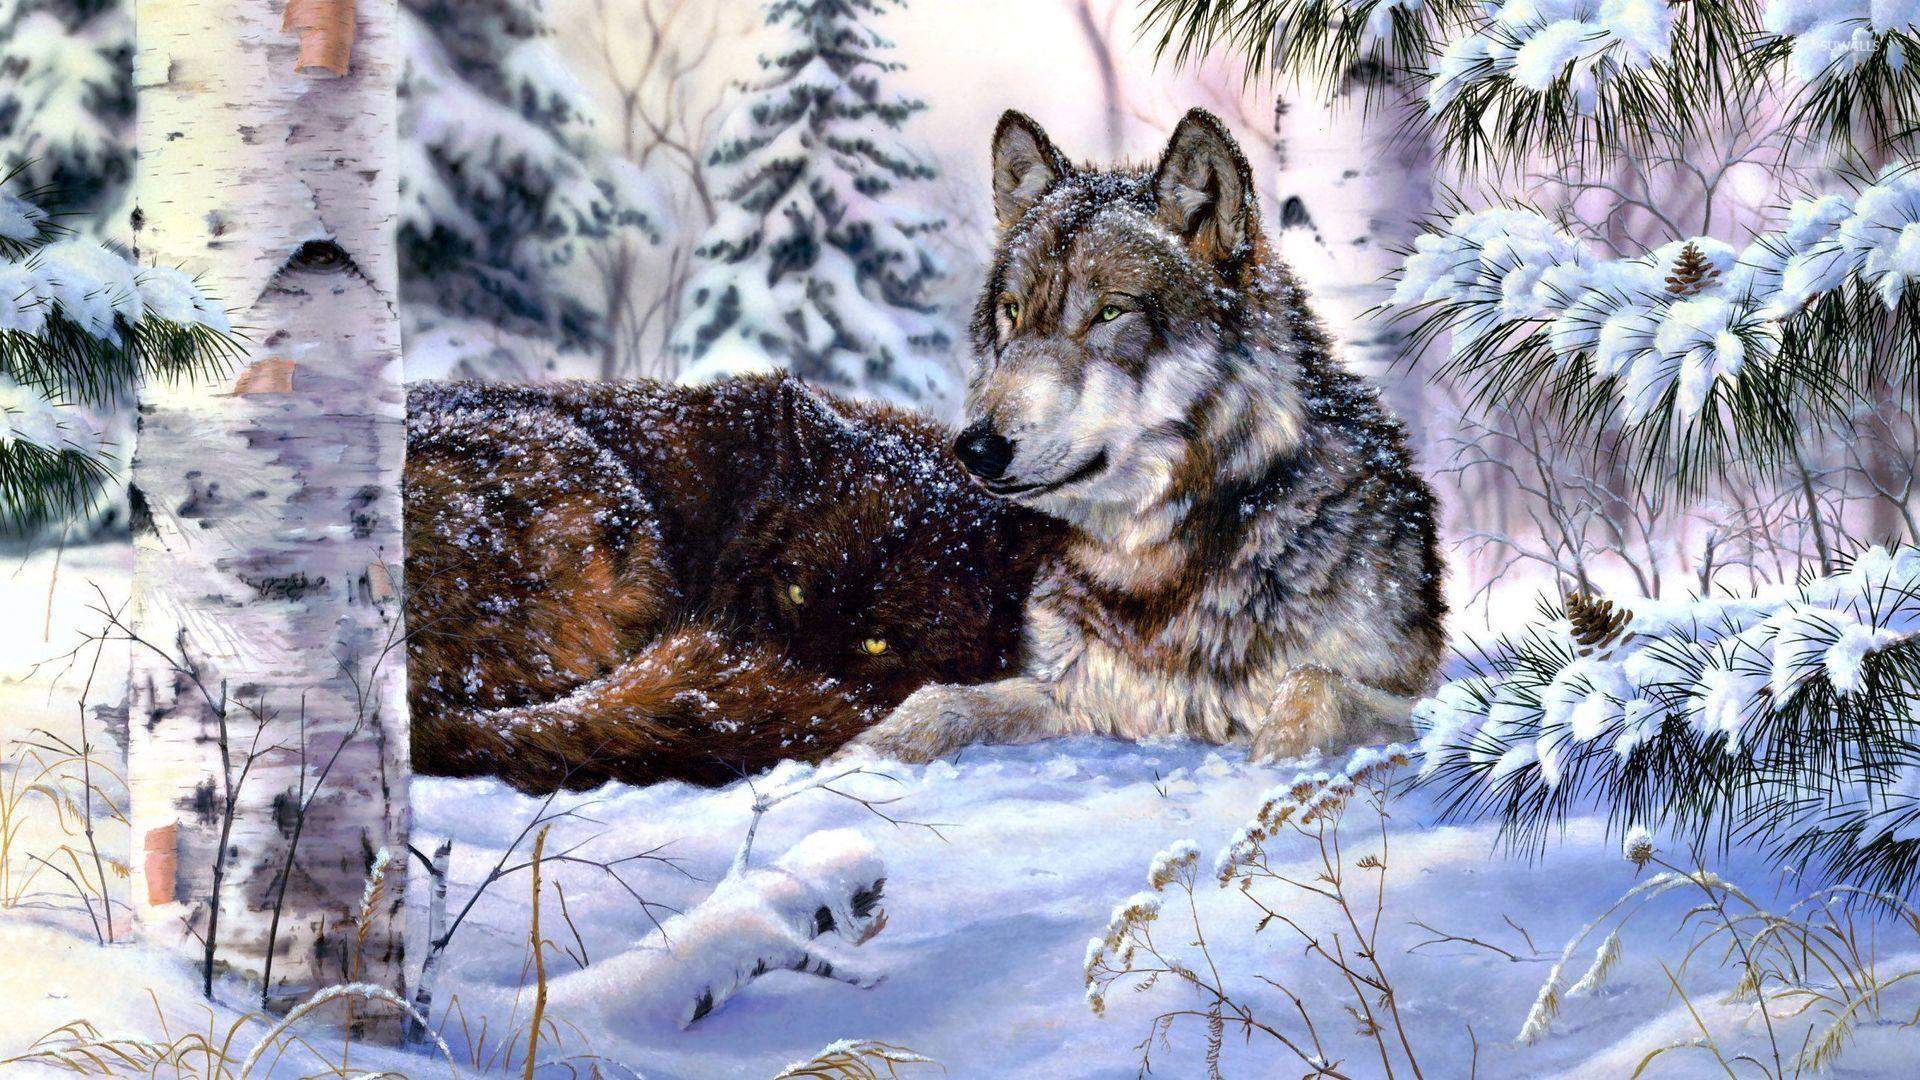 Nevada Wolf Pack Wallpaper: Digital Art Wallpapers